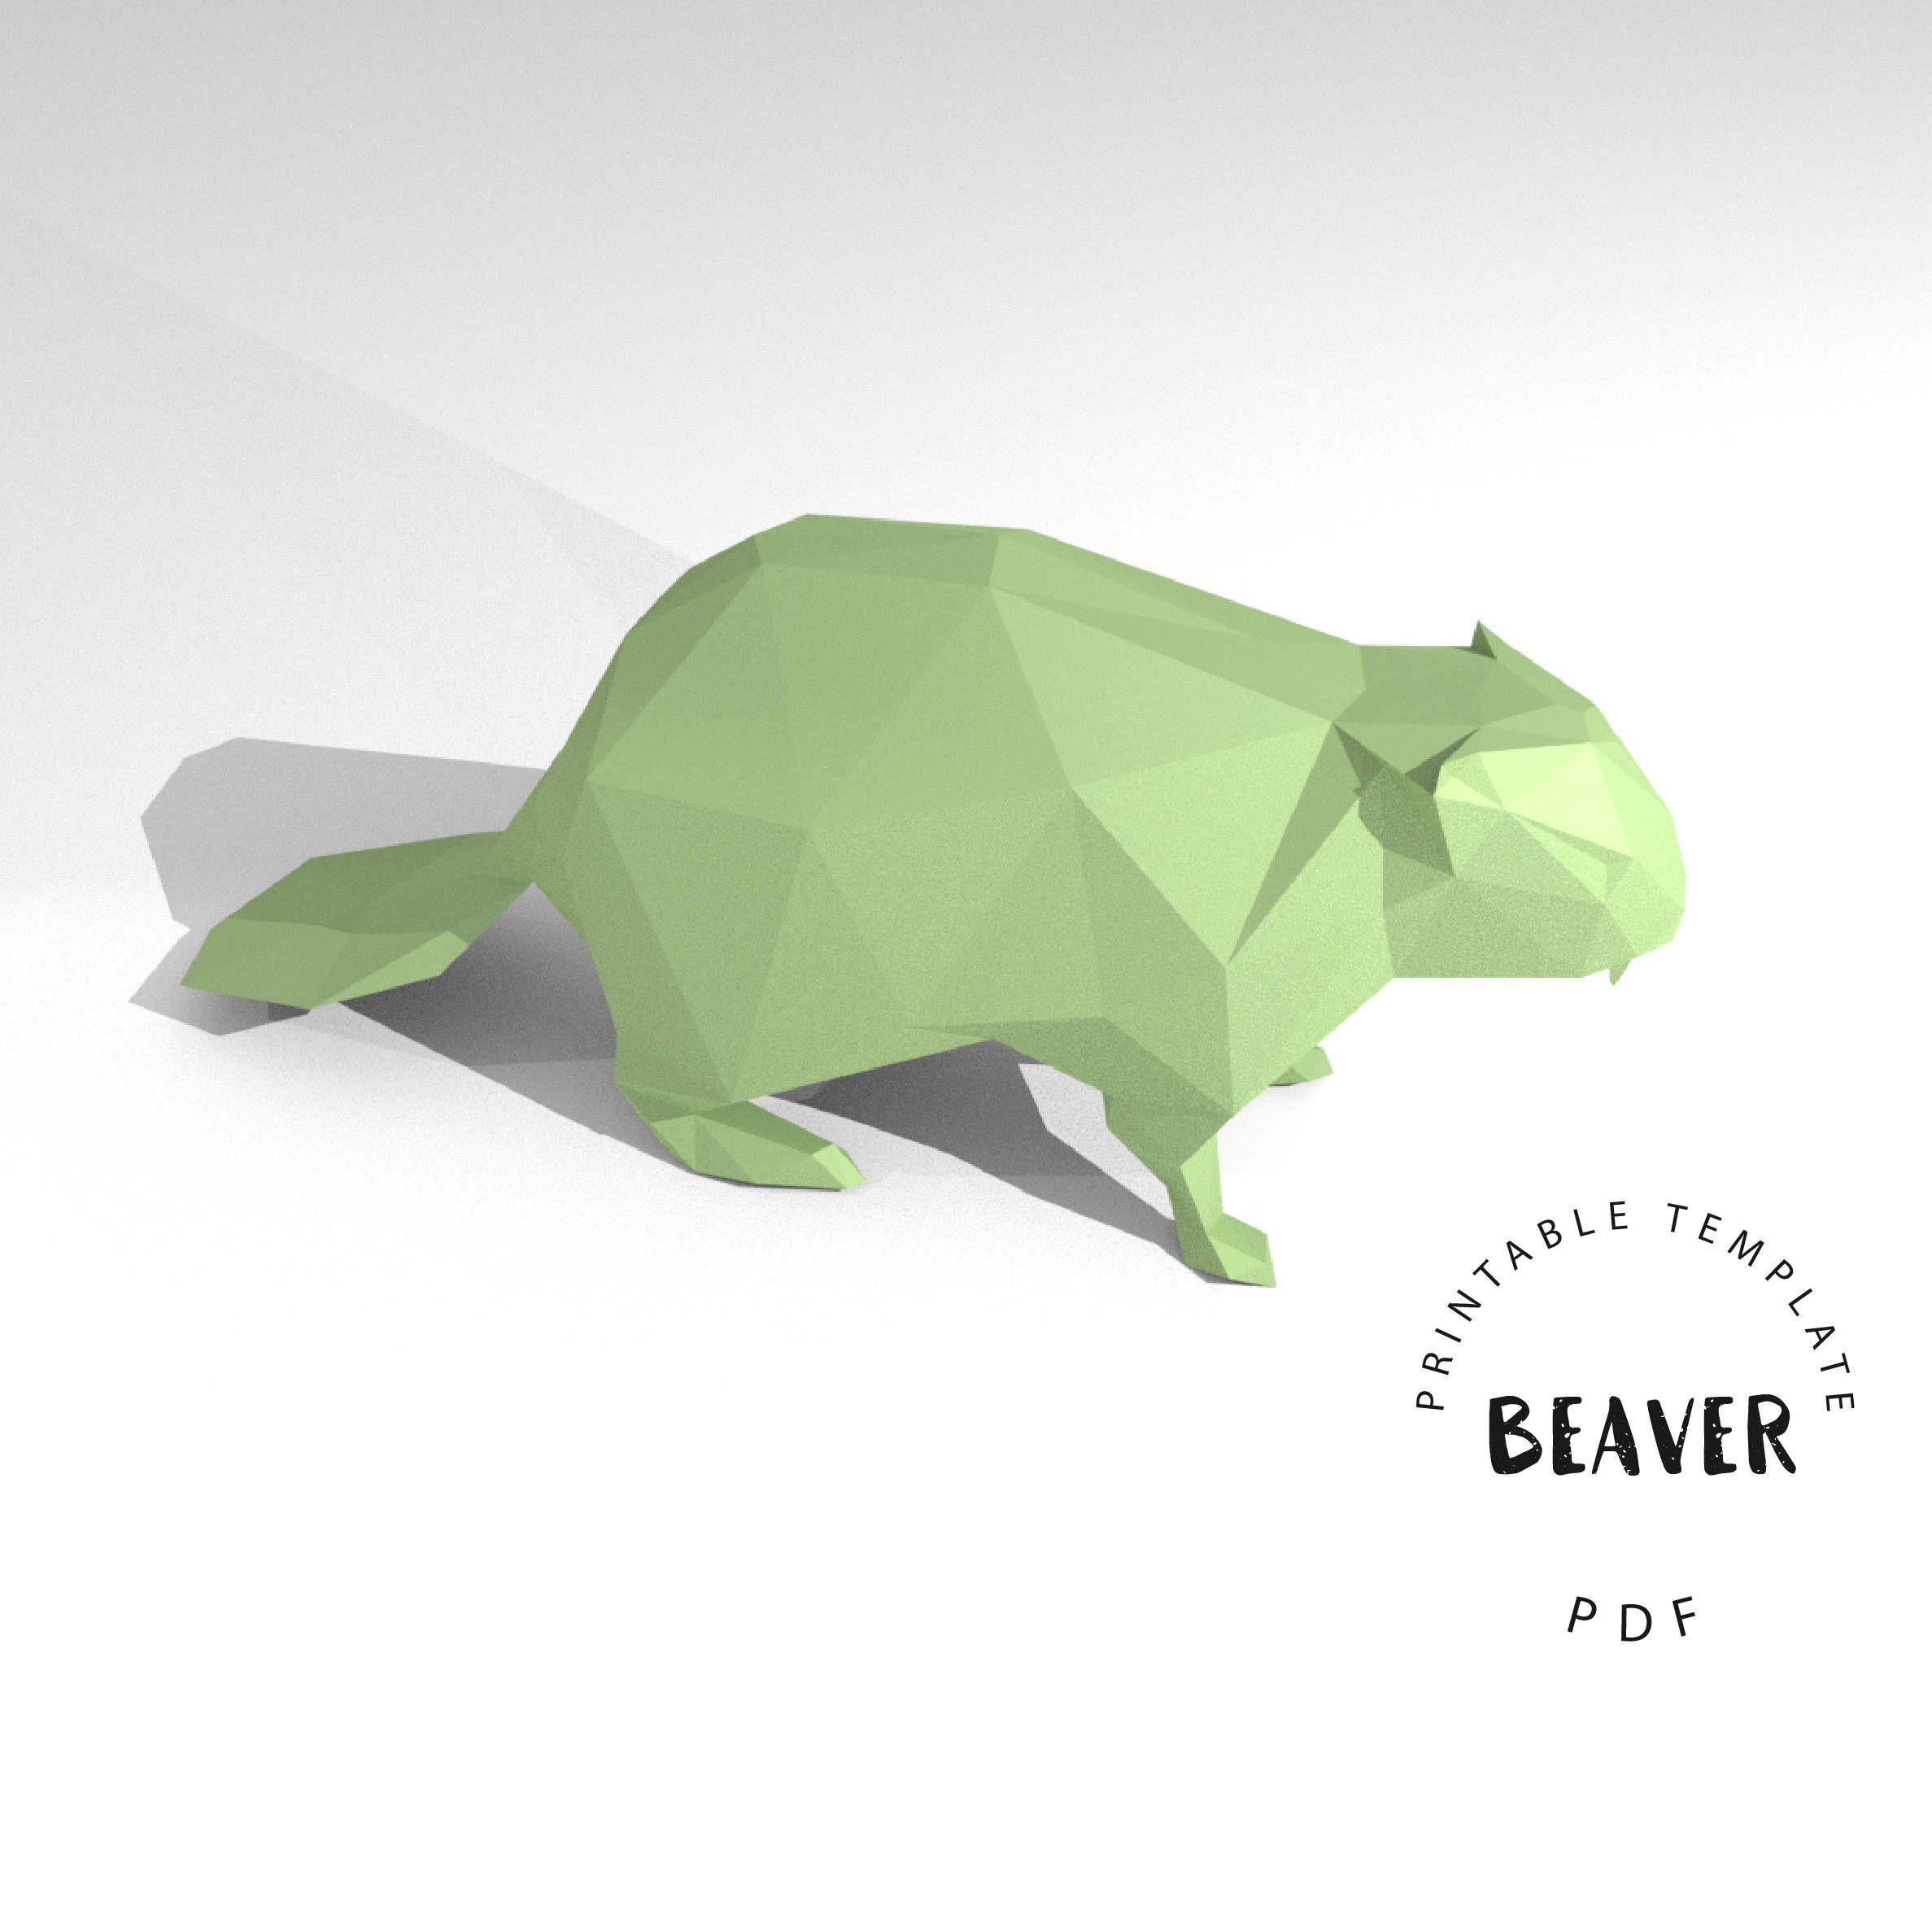 Papercraft Deer Printable Diy Template Pdf Beaver Low Poly Paper Model Template